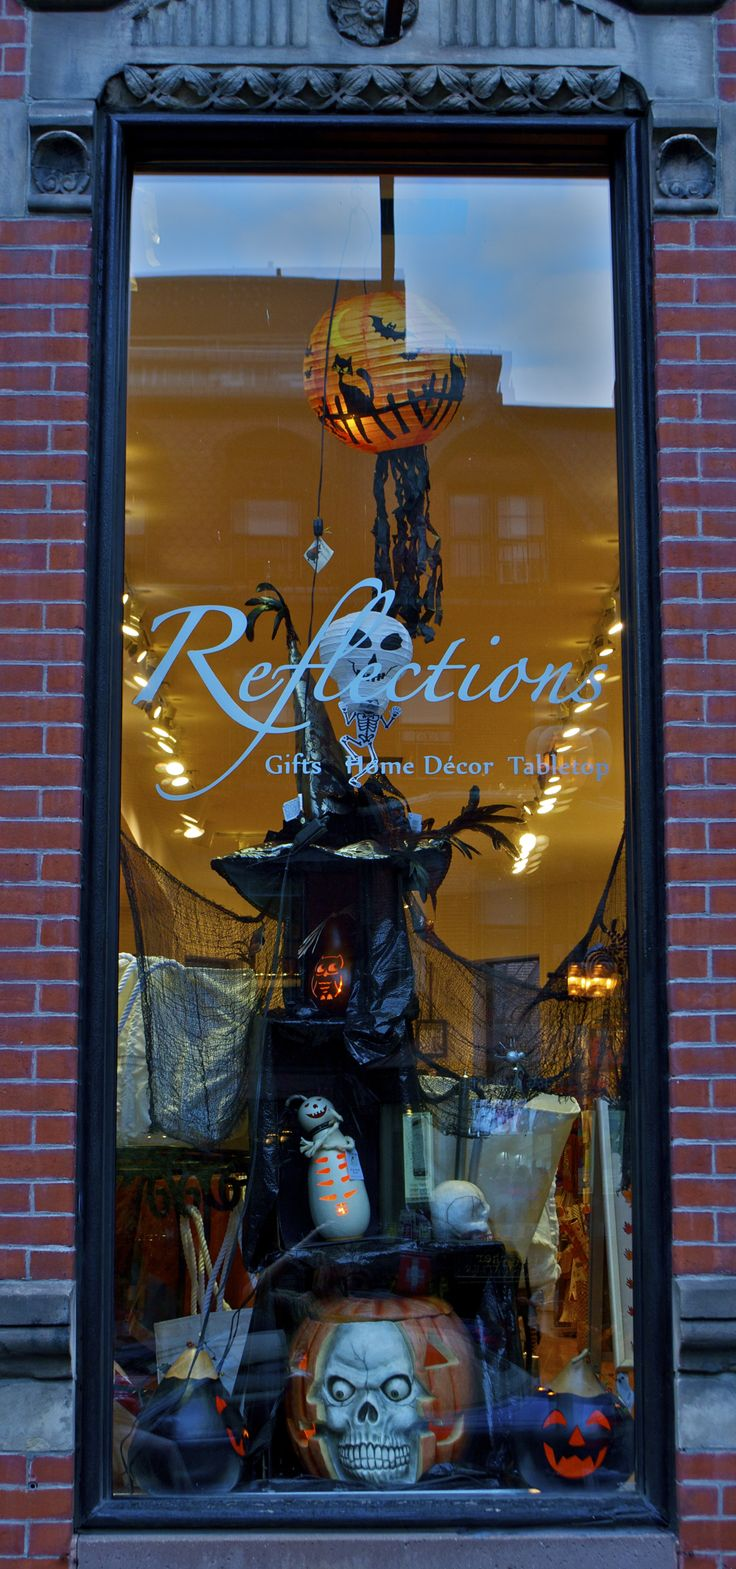 12 best boston shopping images on pinterest boston boston